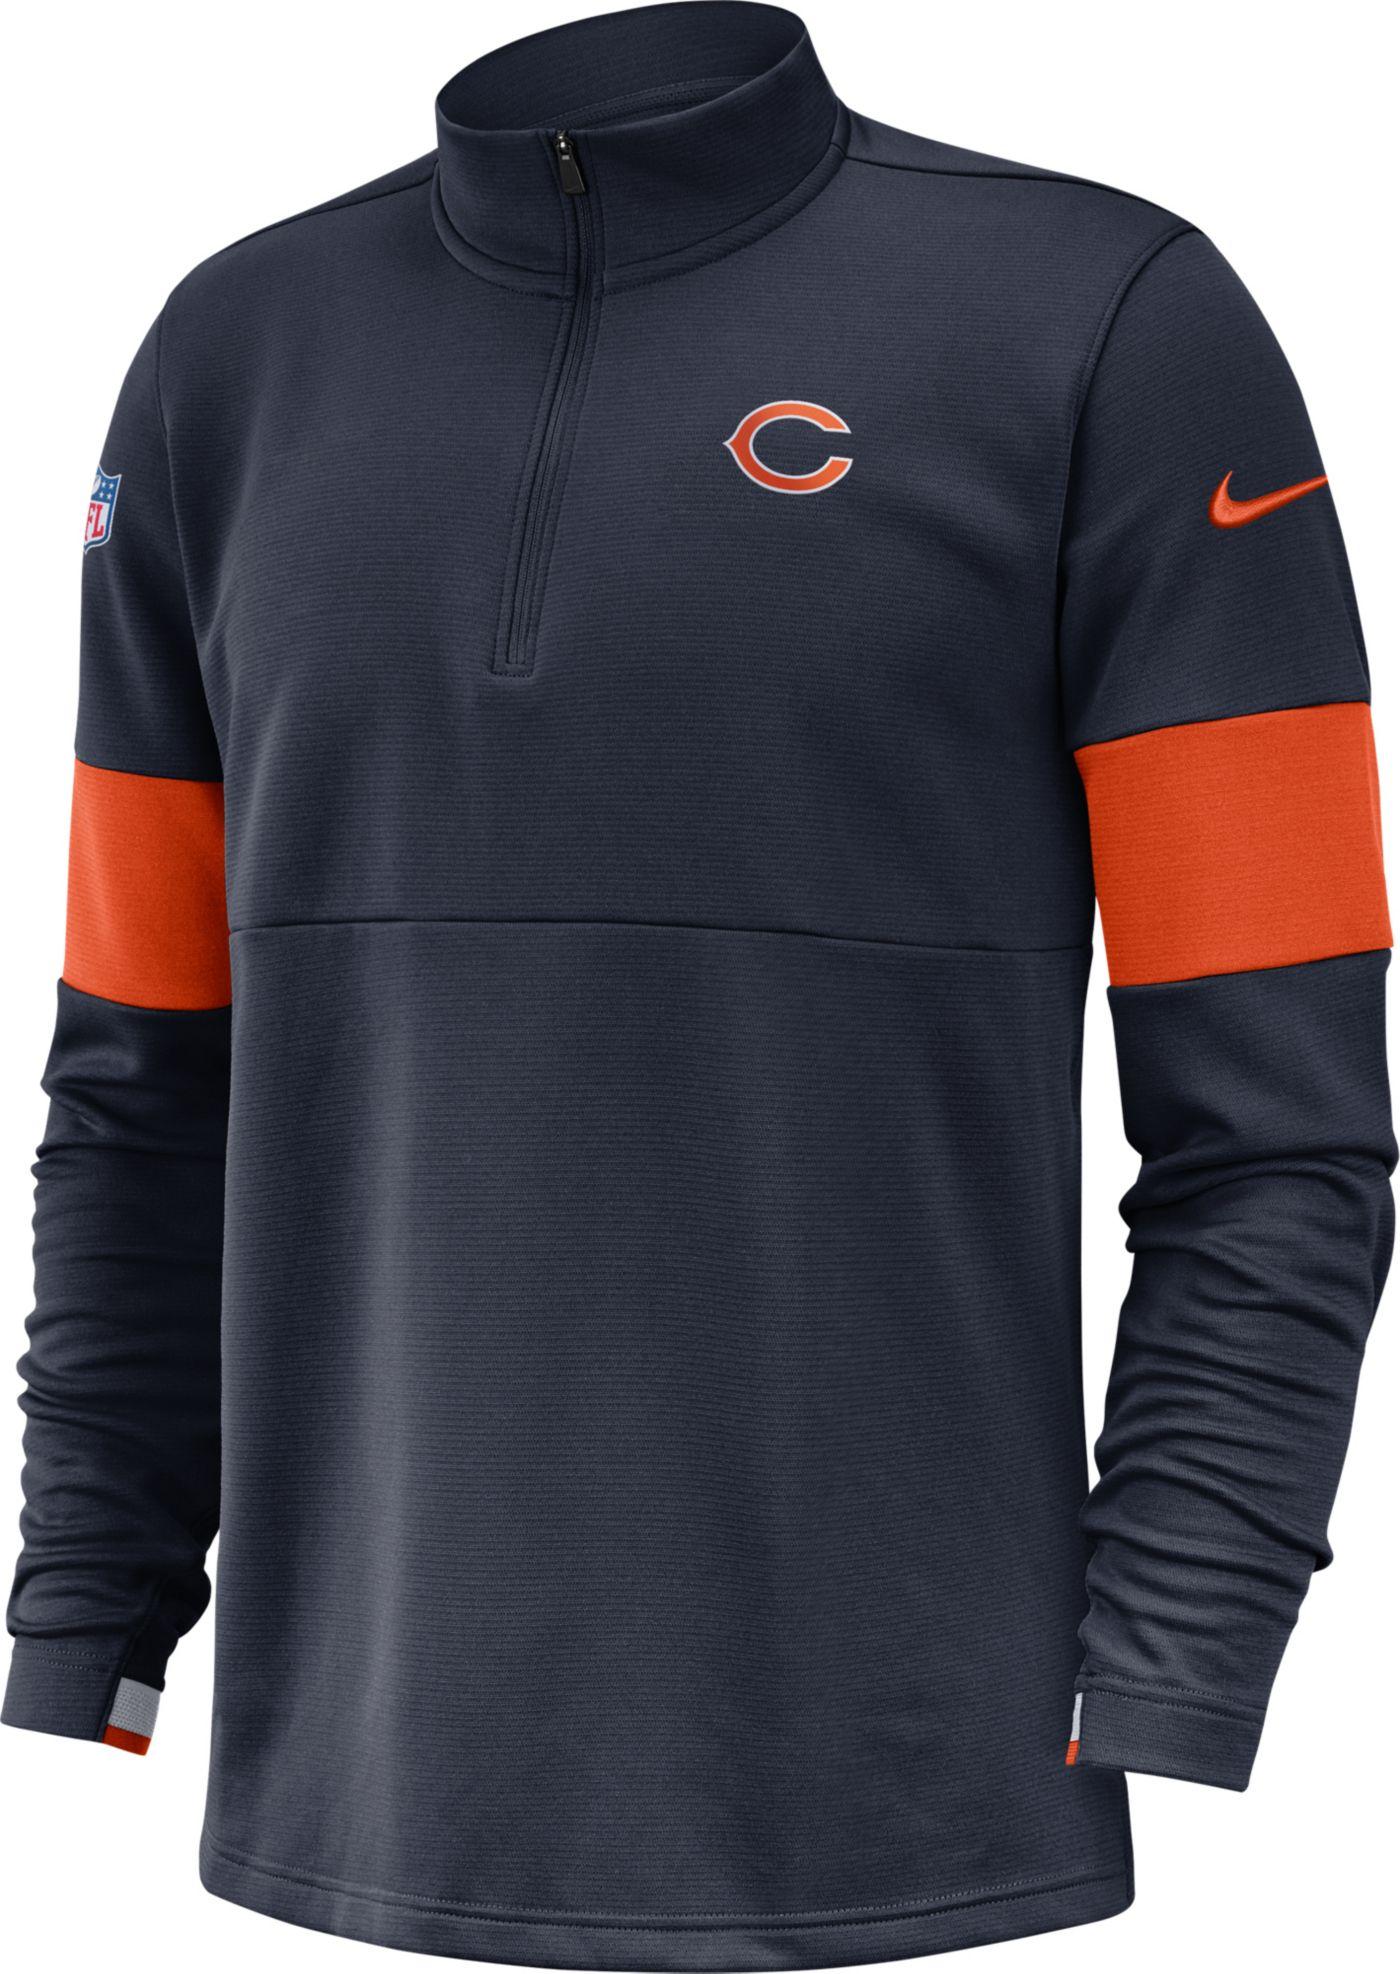 Nike Men's Chicago Bears Sideline Coach Performance Navy Half-Zip Pullover